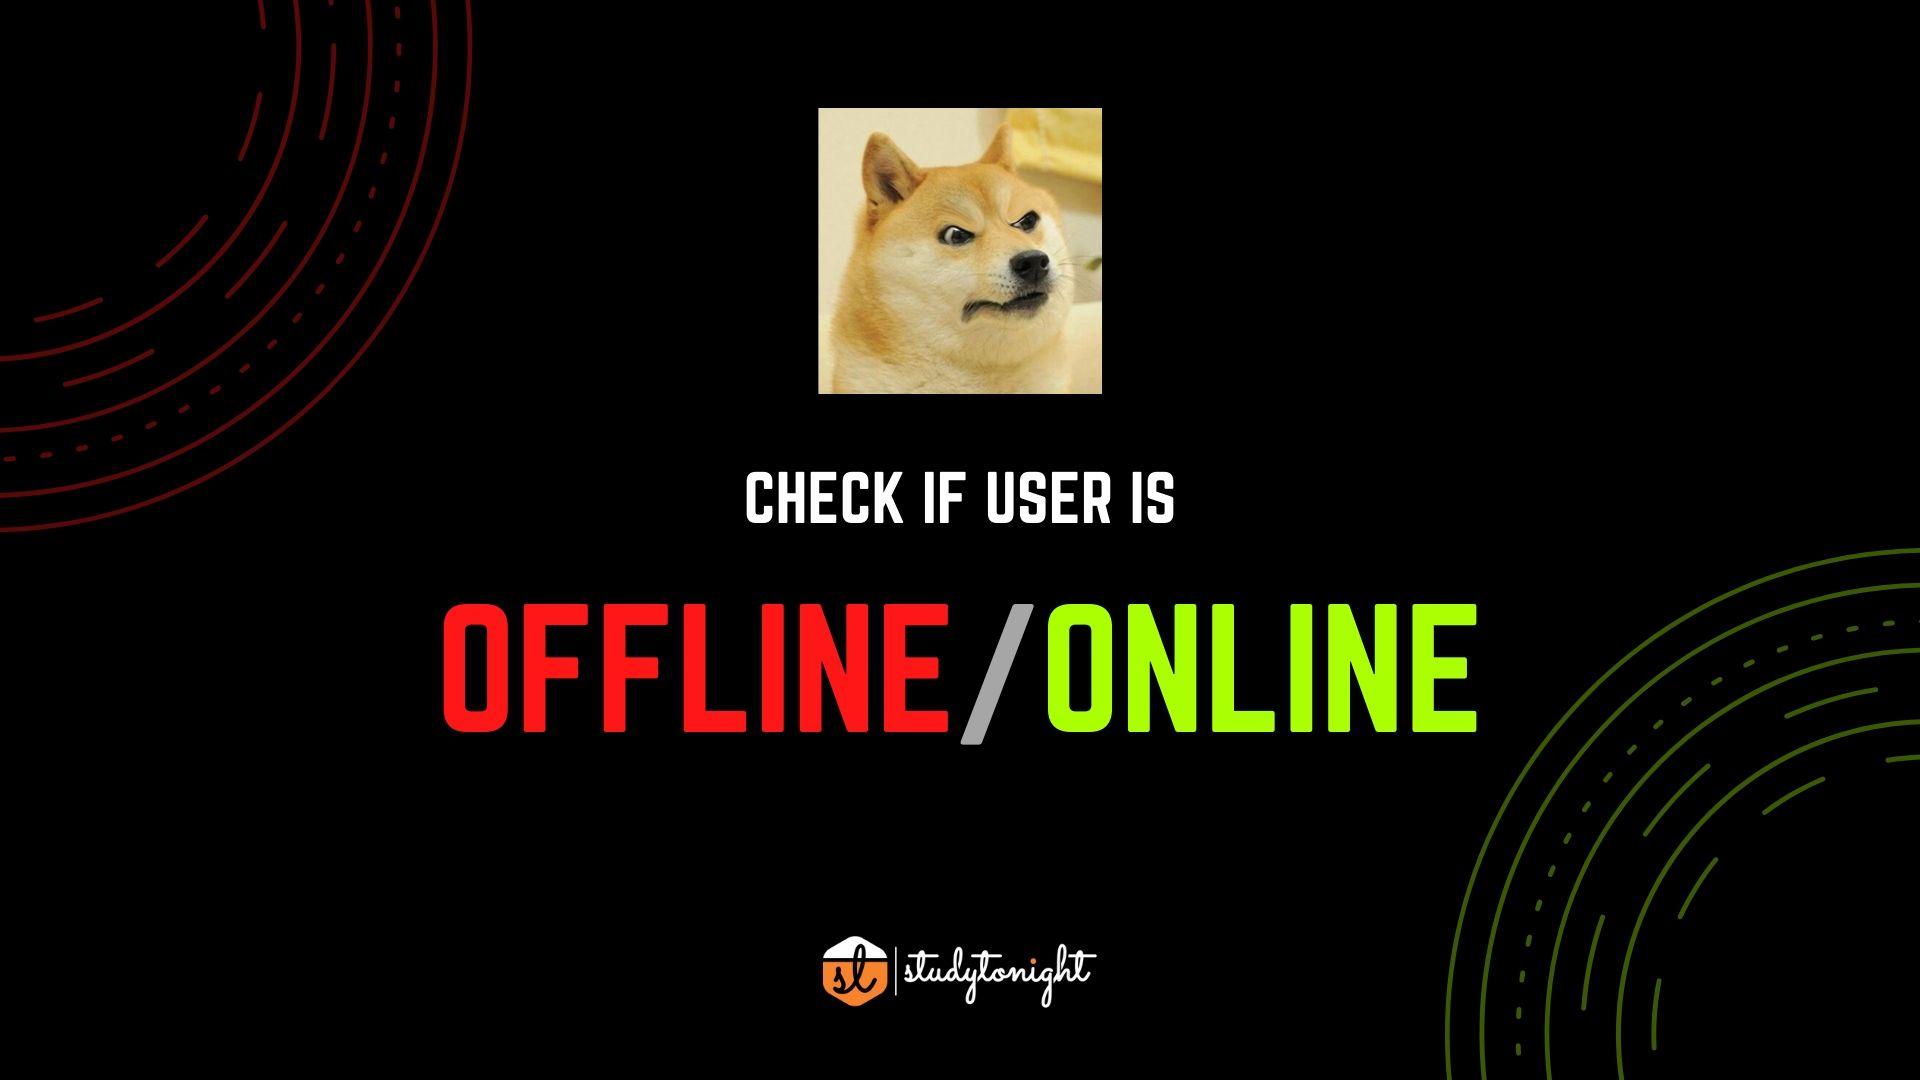 check if user is offline/online in Javascript